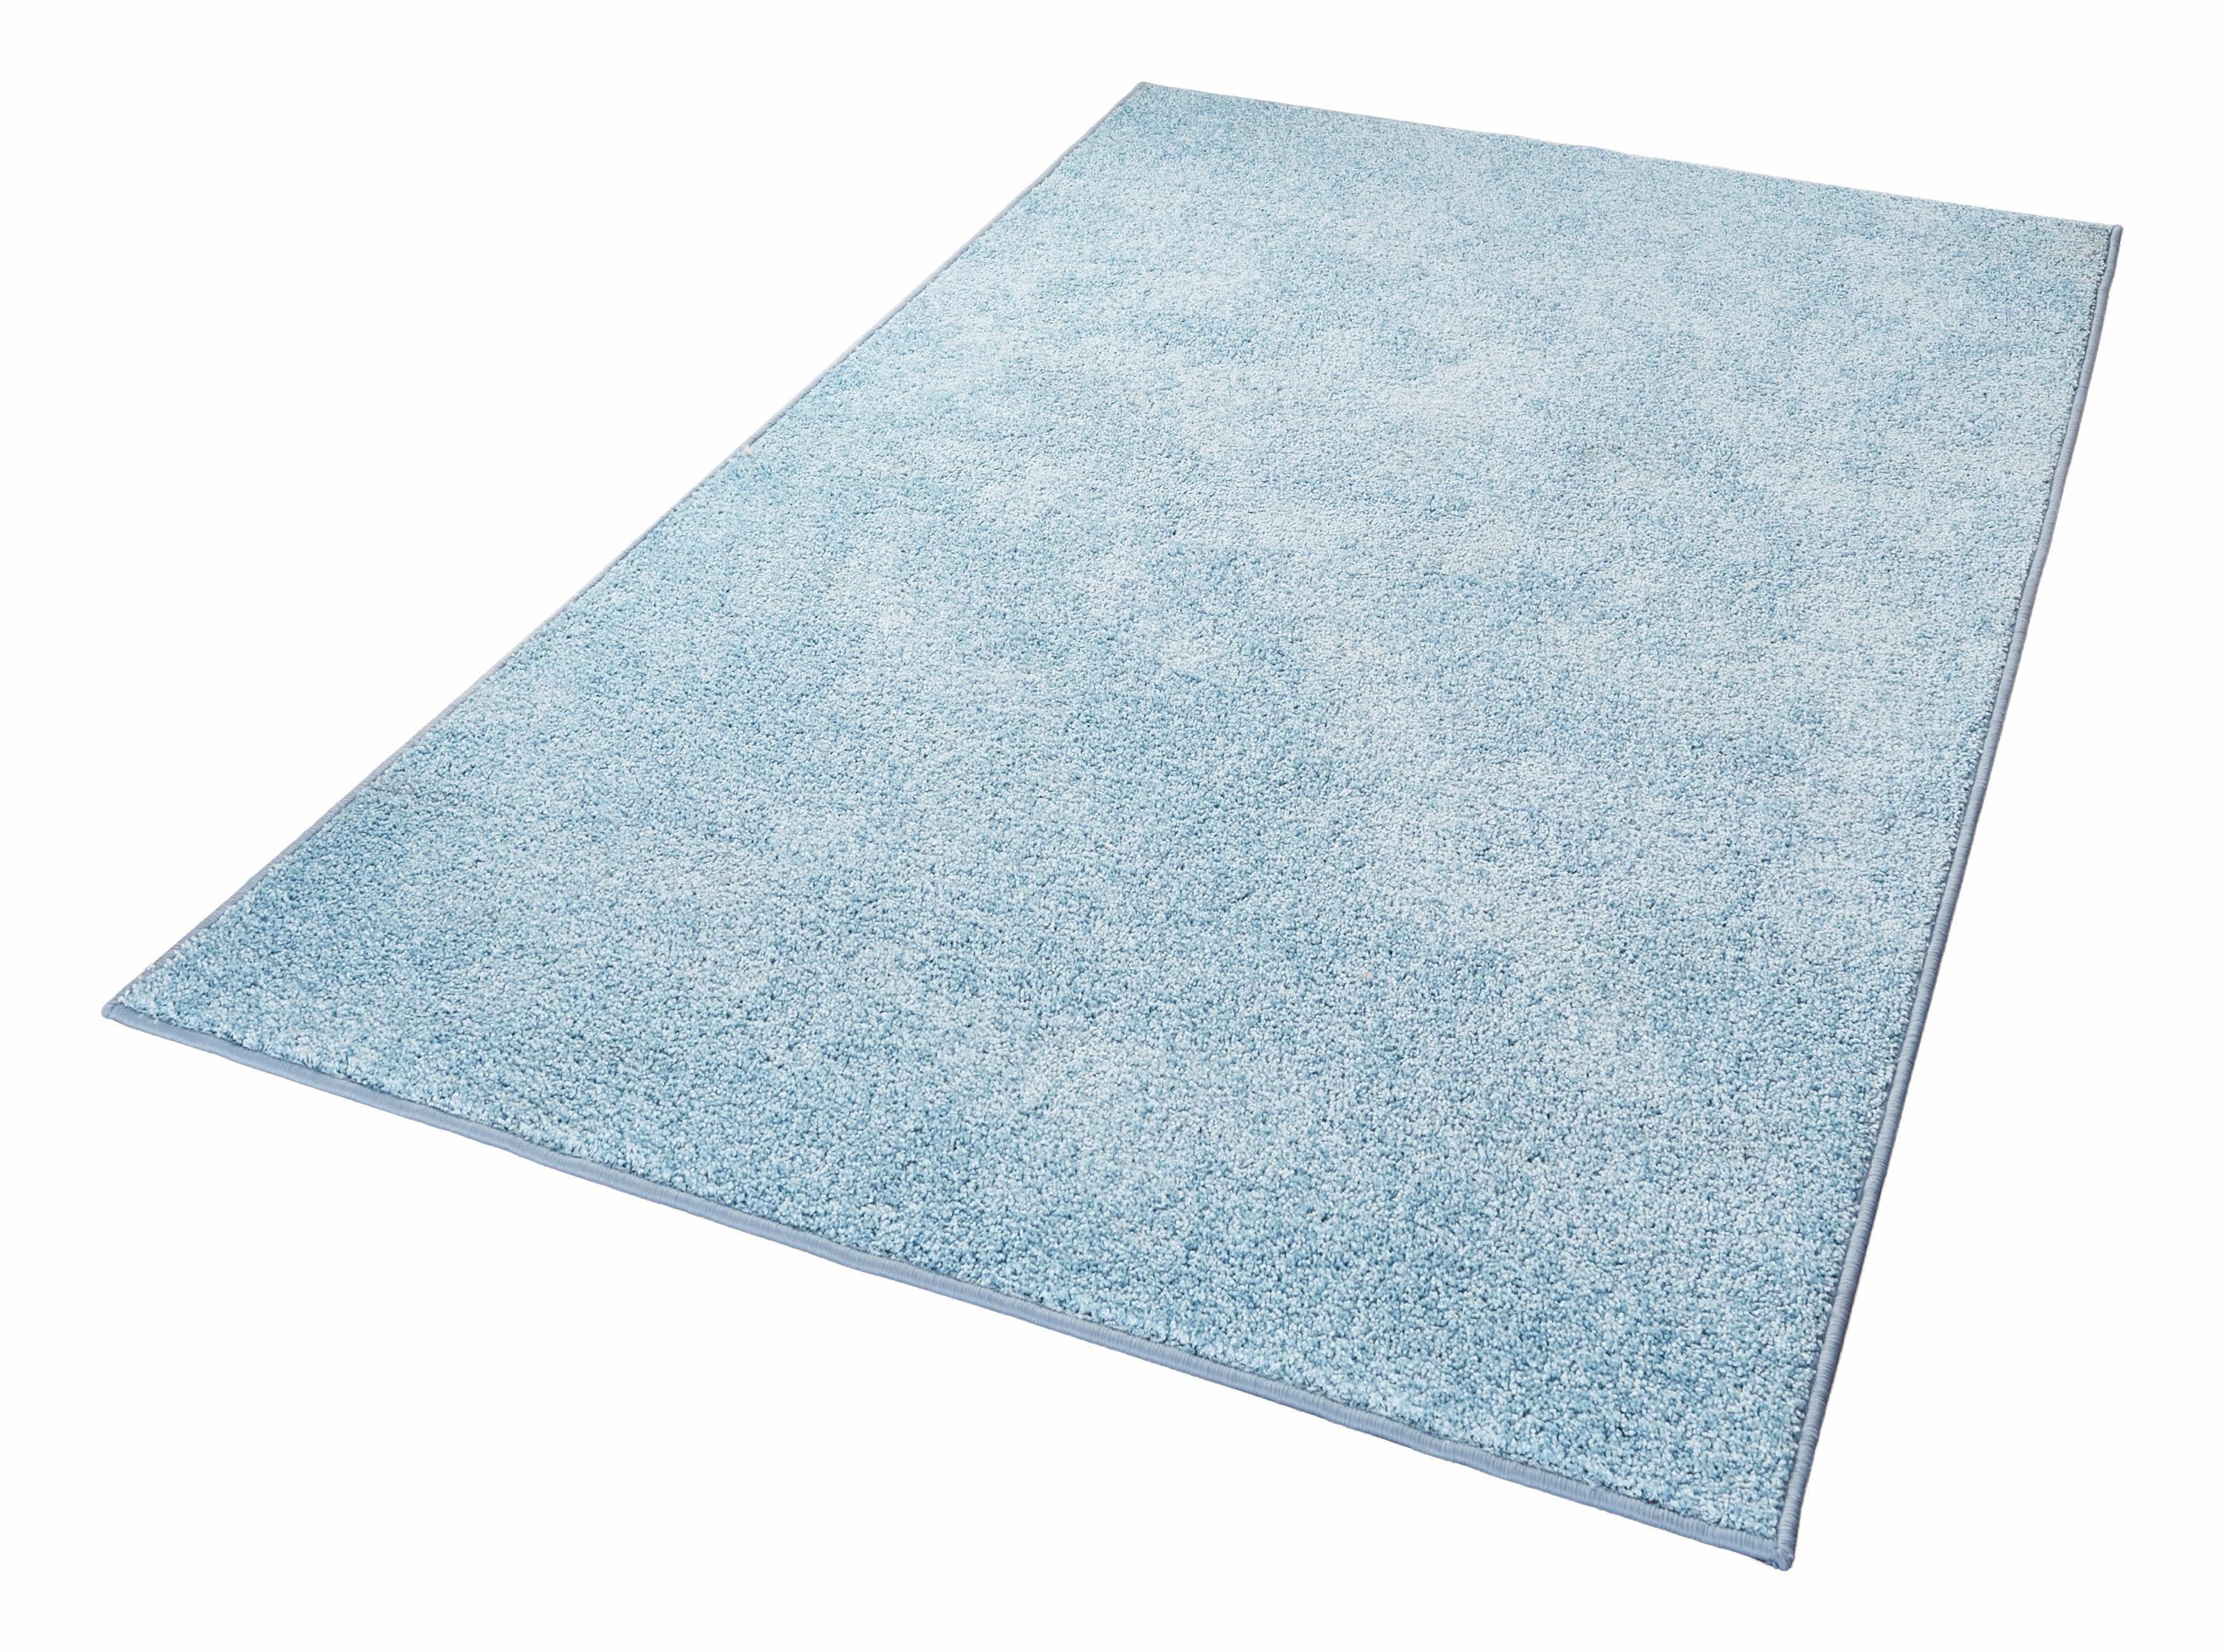 Teppich pure « hanse home rechteckig höhe mm online